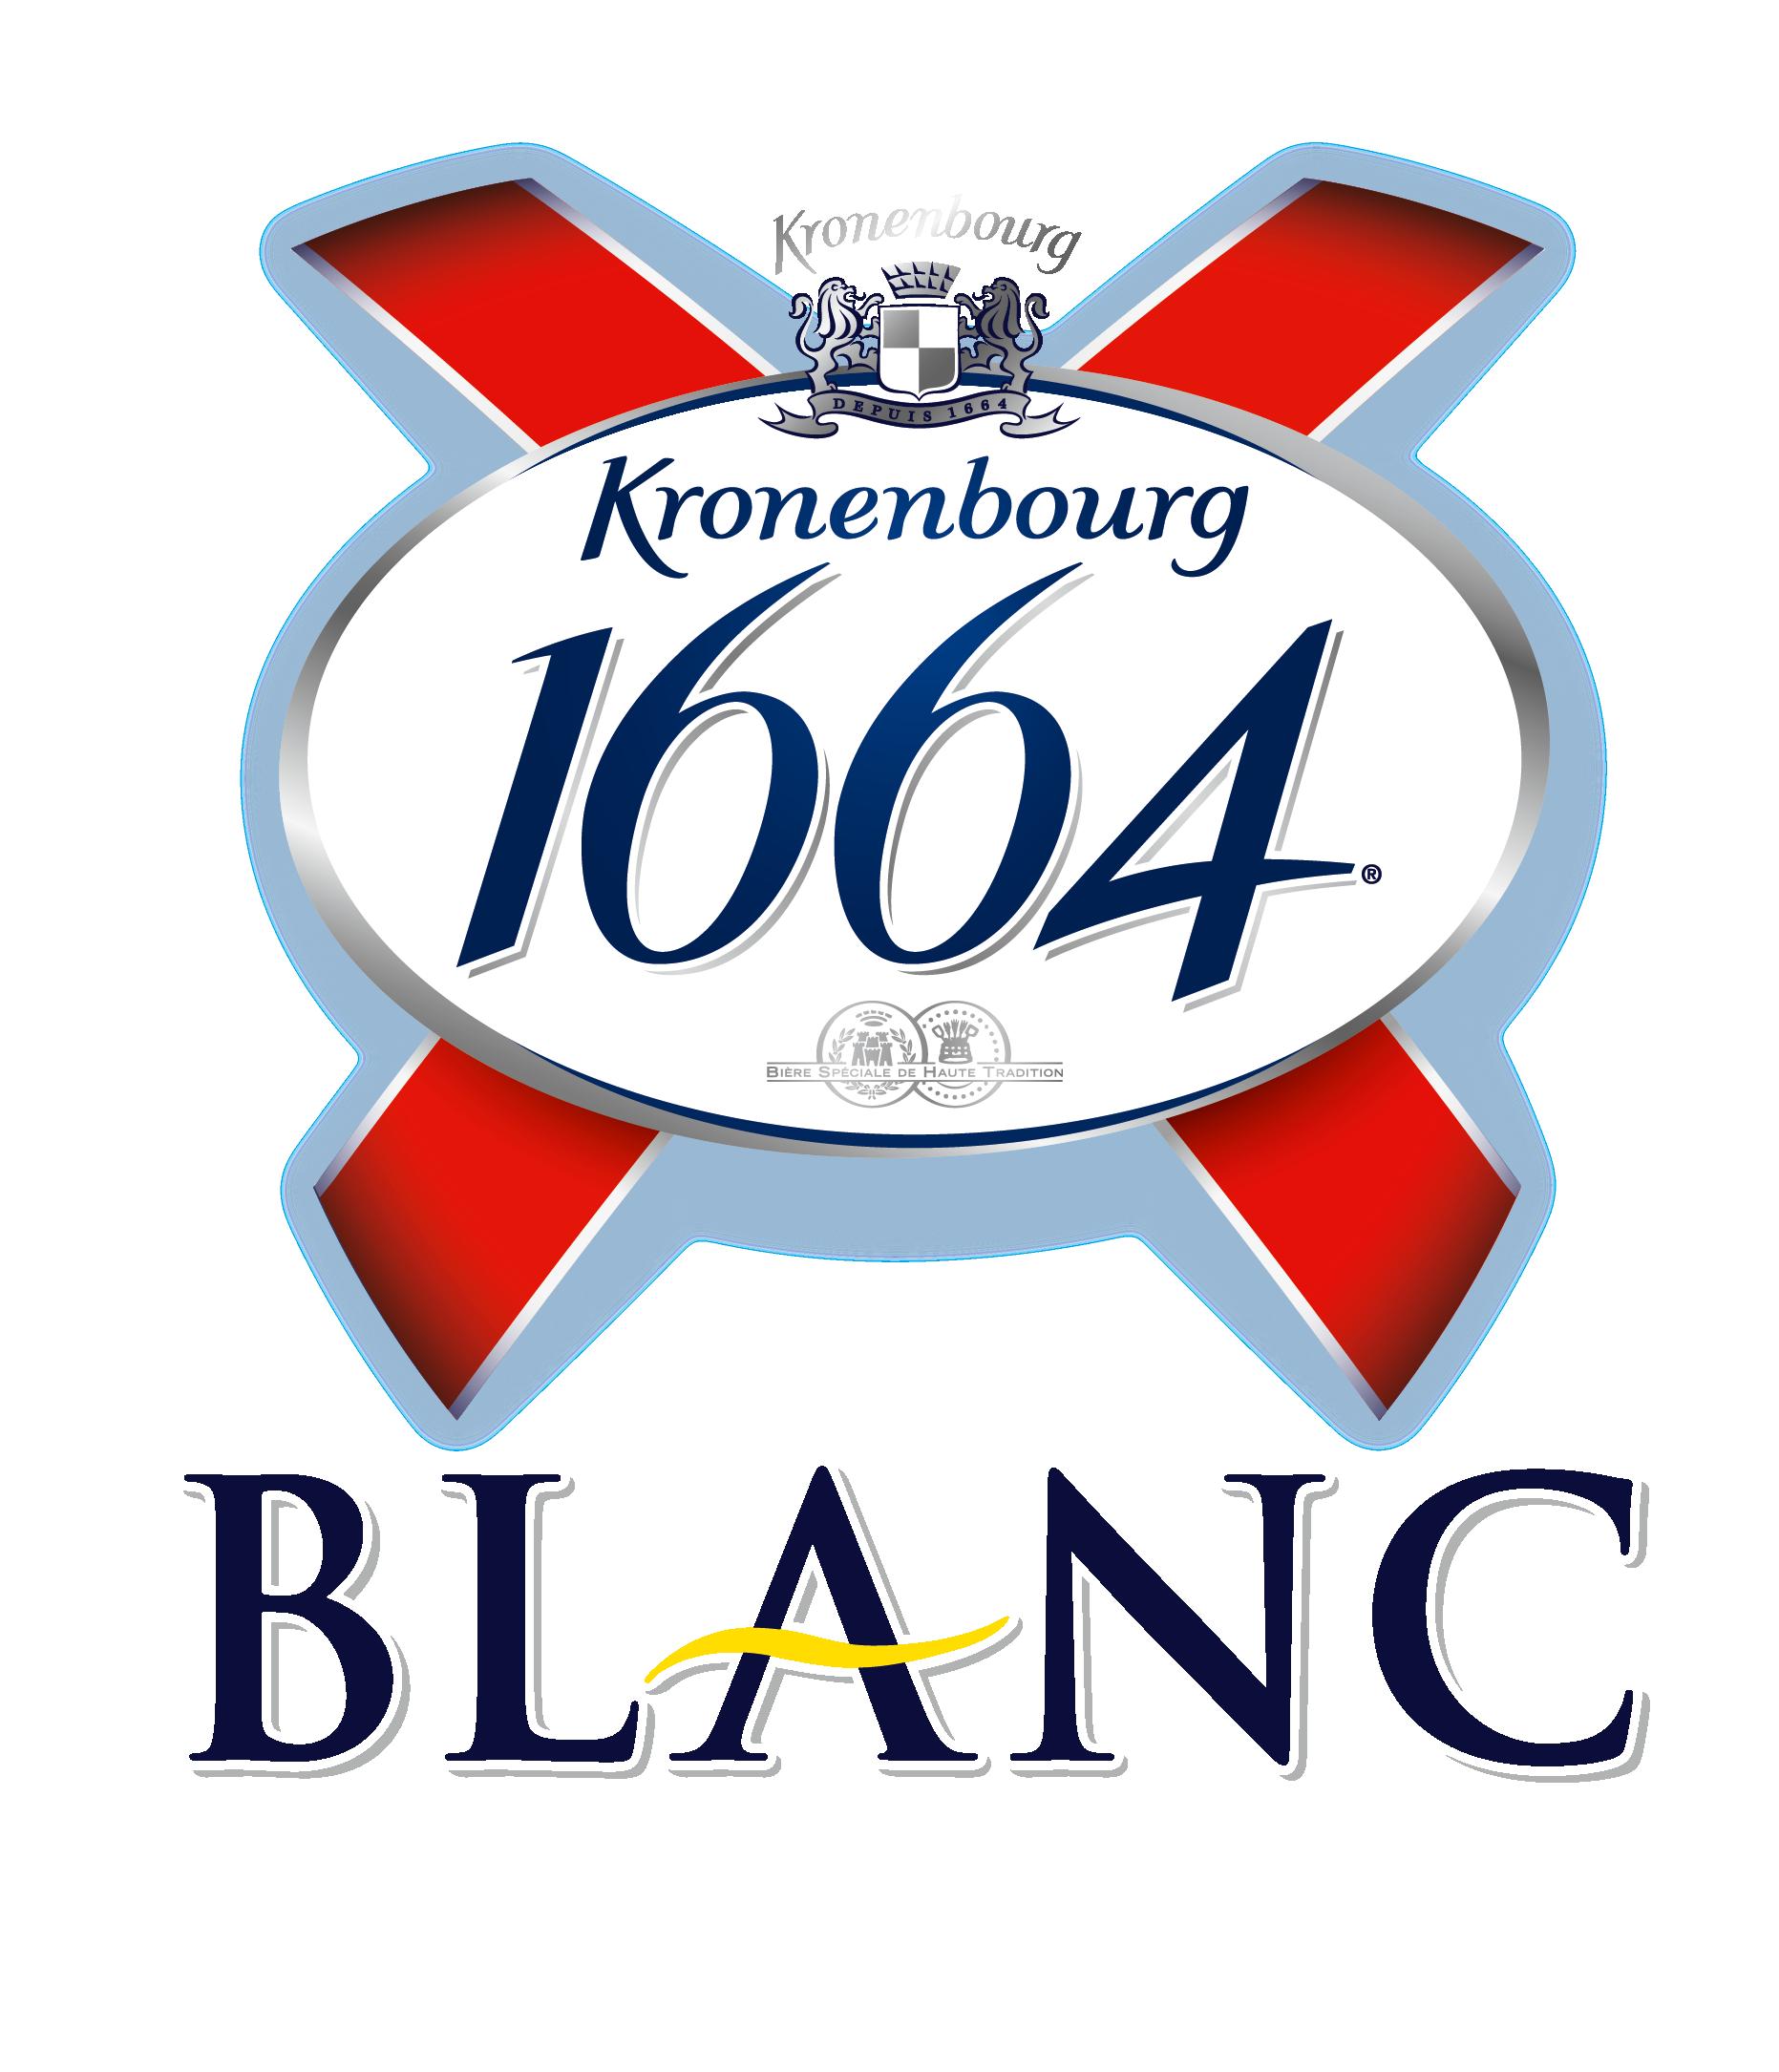 https://bierimport.nl/wp-content/uploads/2018/02/BierImport_Kronenbourg_Logo.png